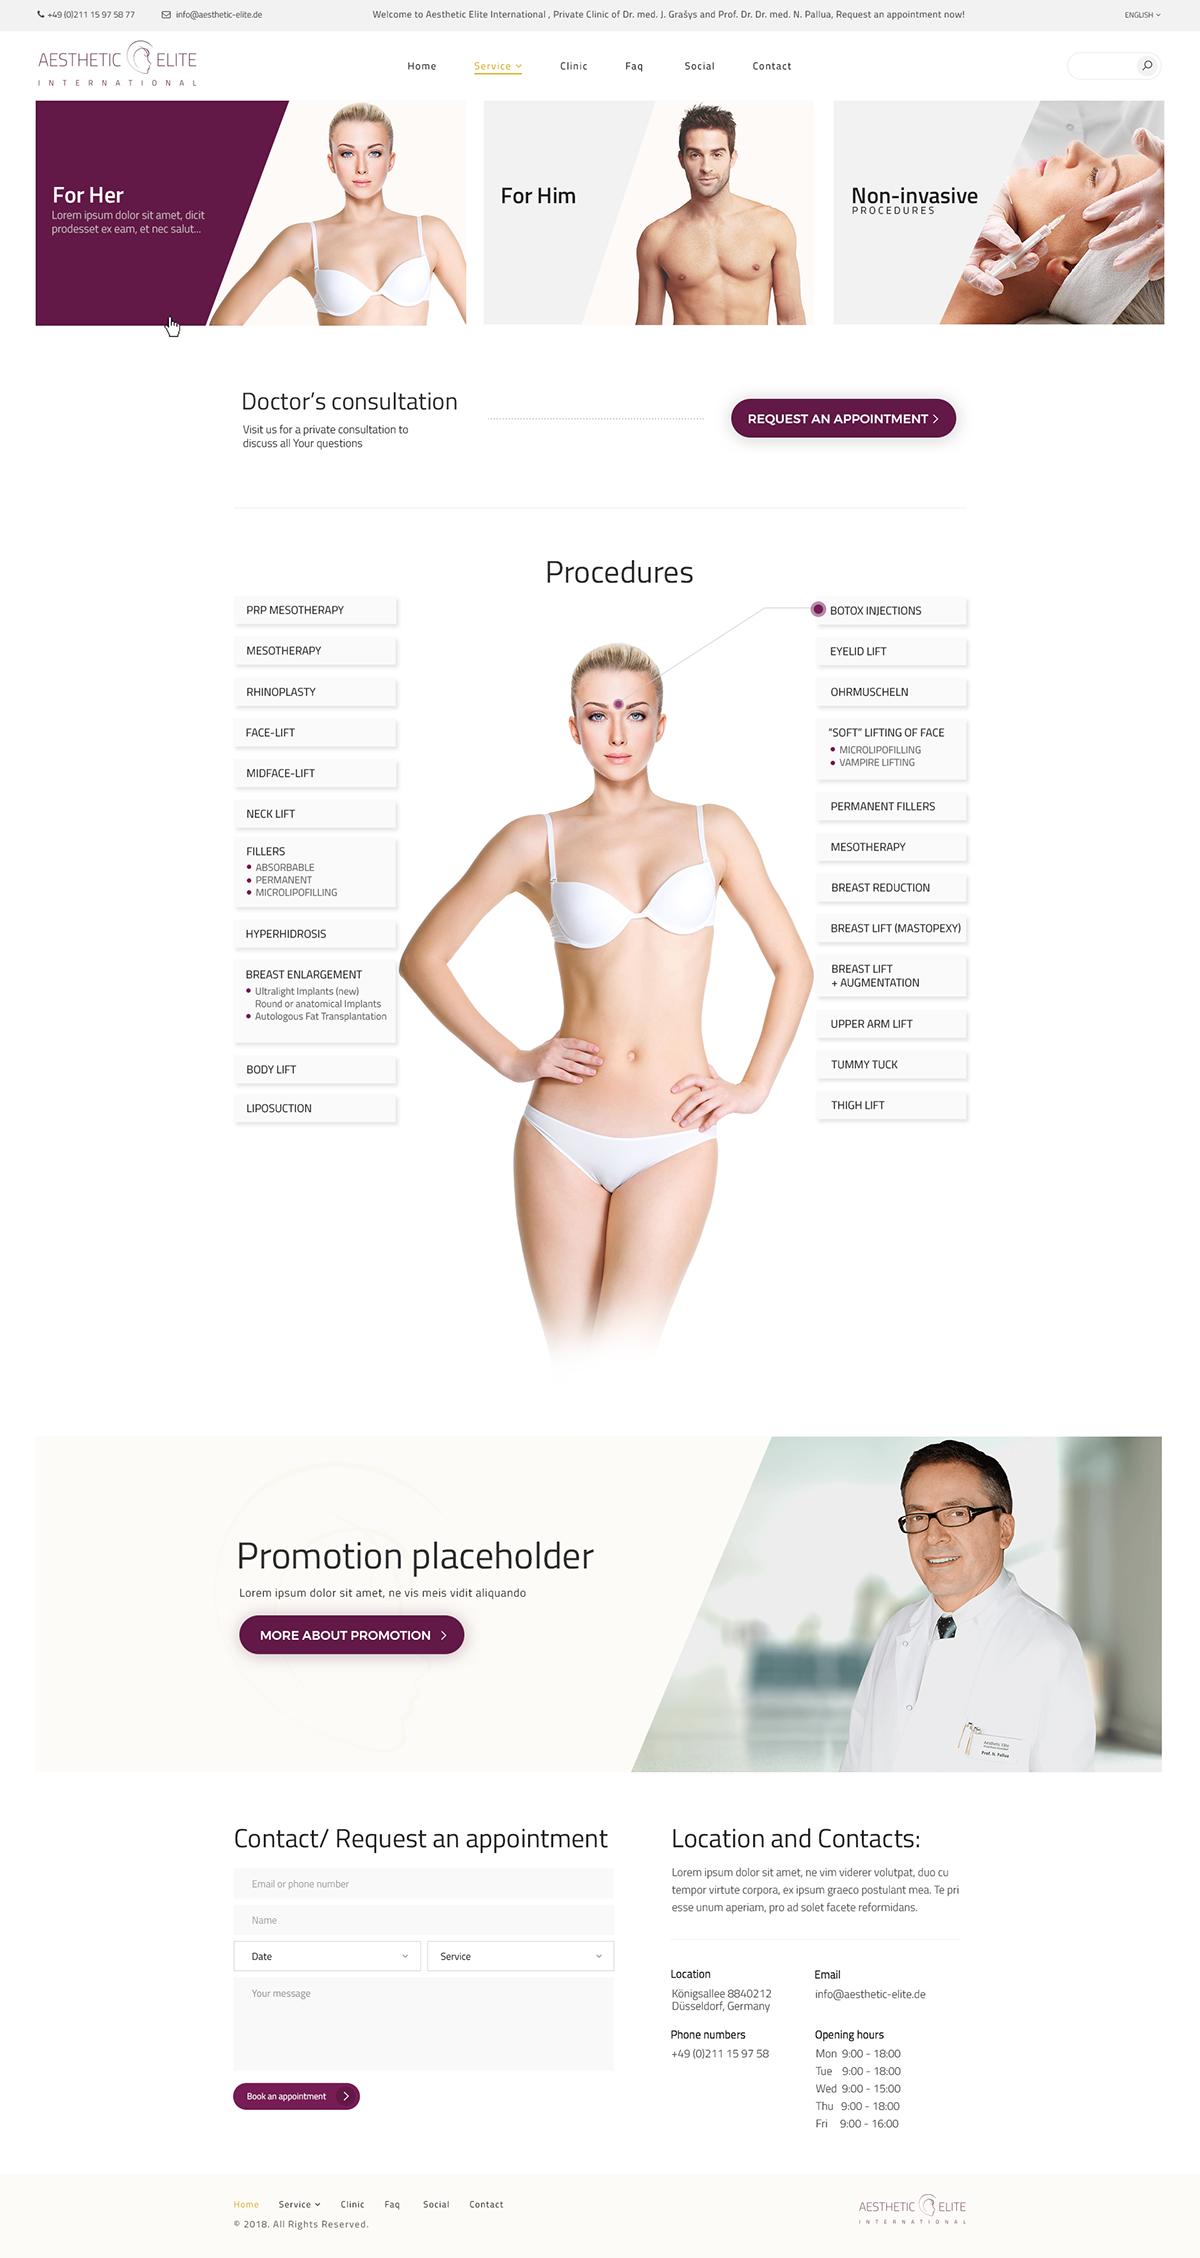 plactic surgery beauty body alius cechas procedures White doctor skin